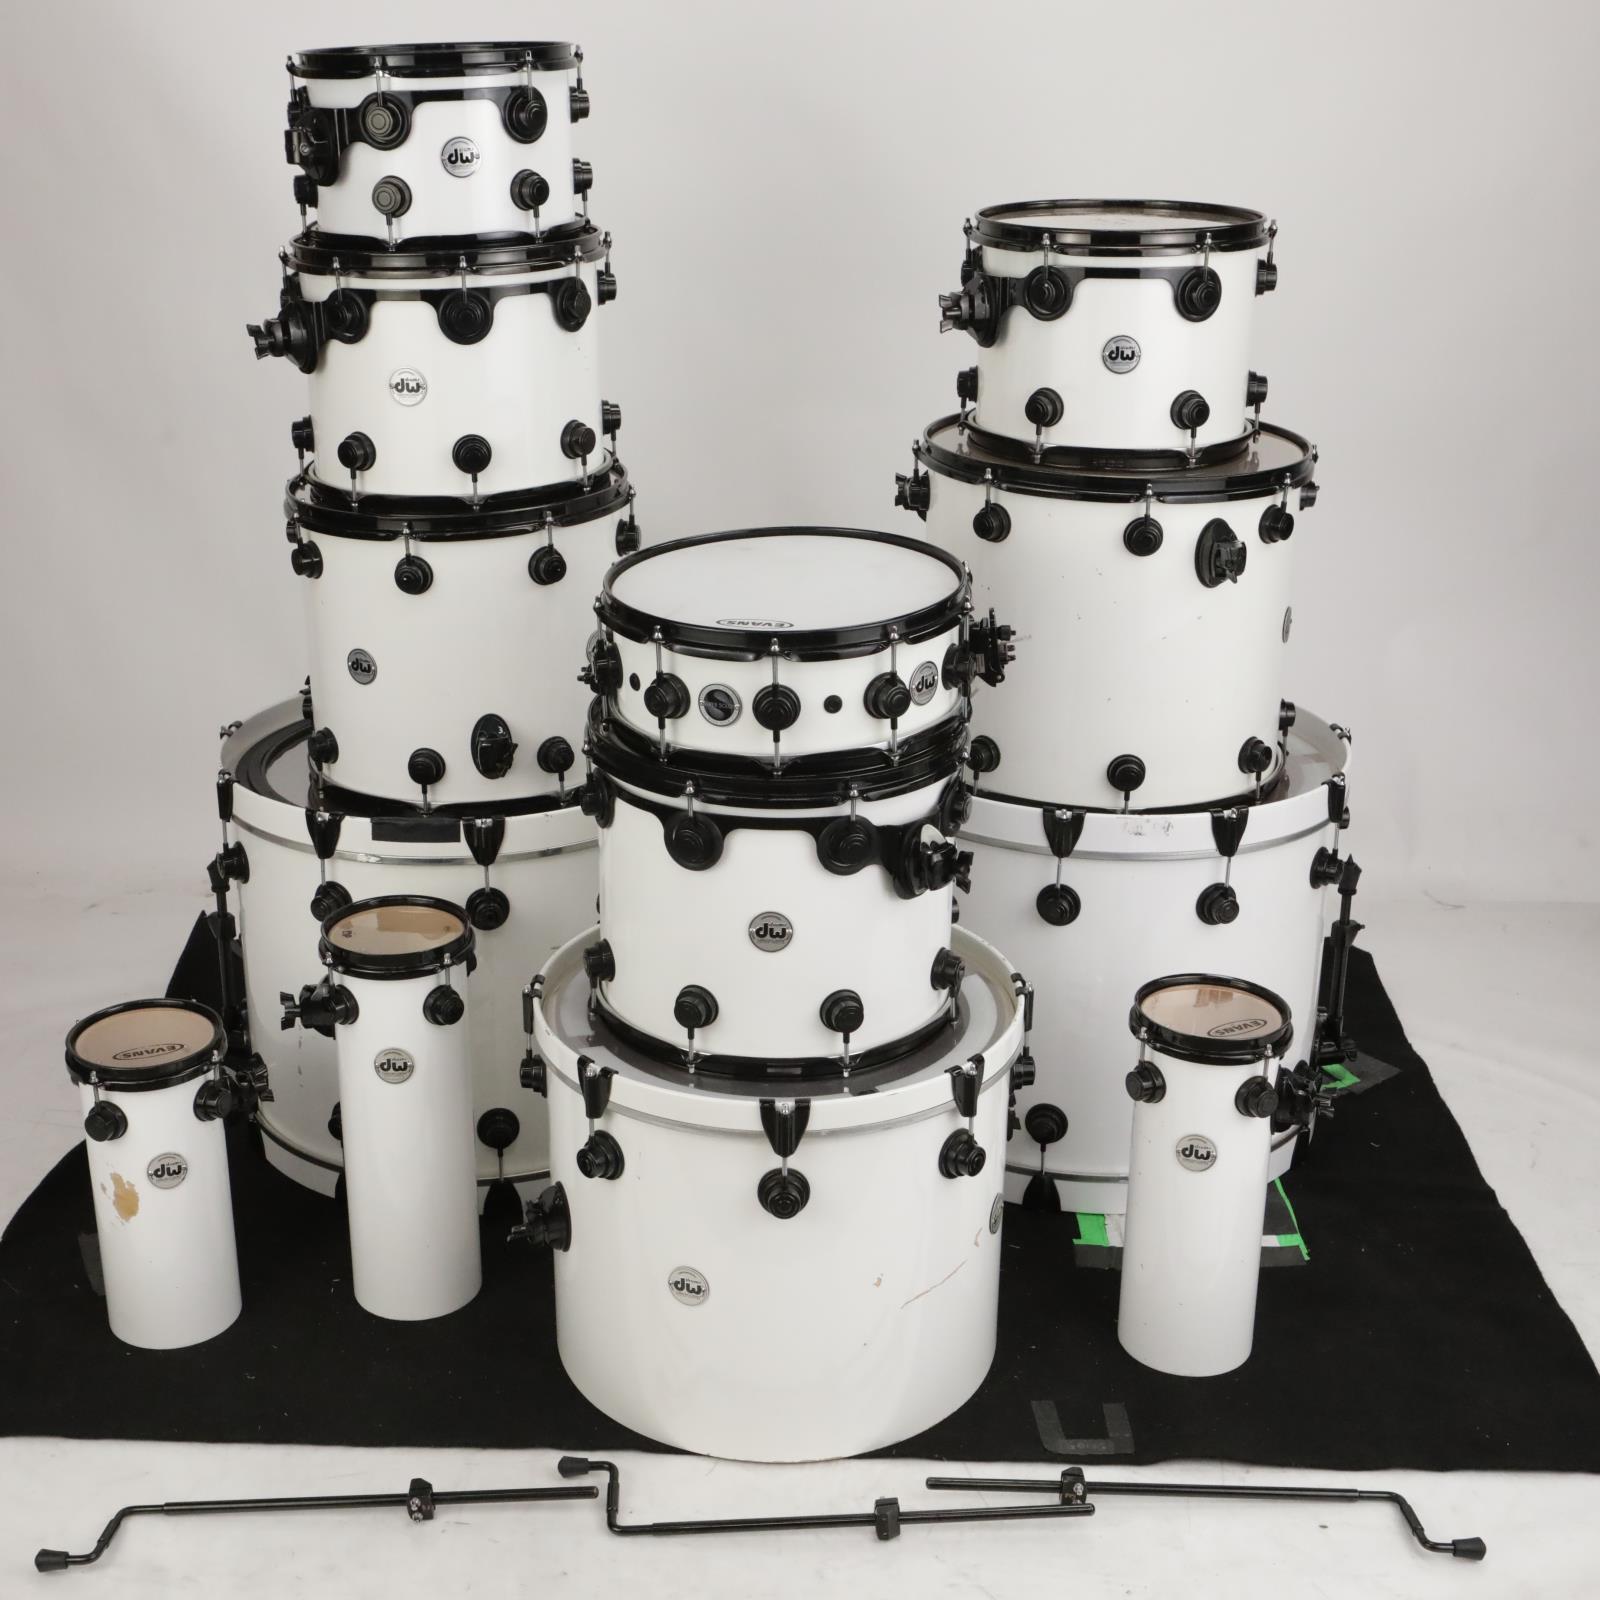 13pc DW Collector's Custom Maple Drum Kit VLT VLX X-Shell Roy Mayorga #37620